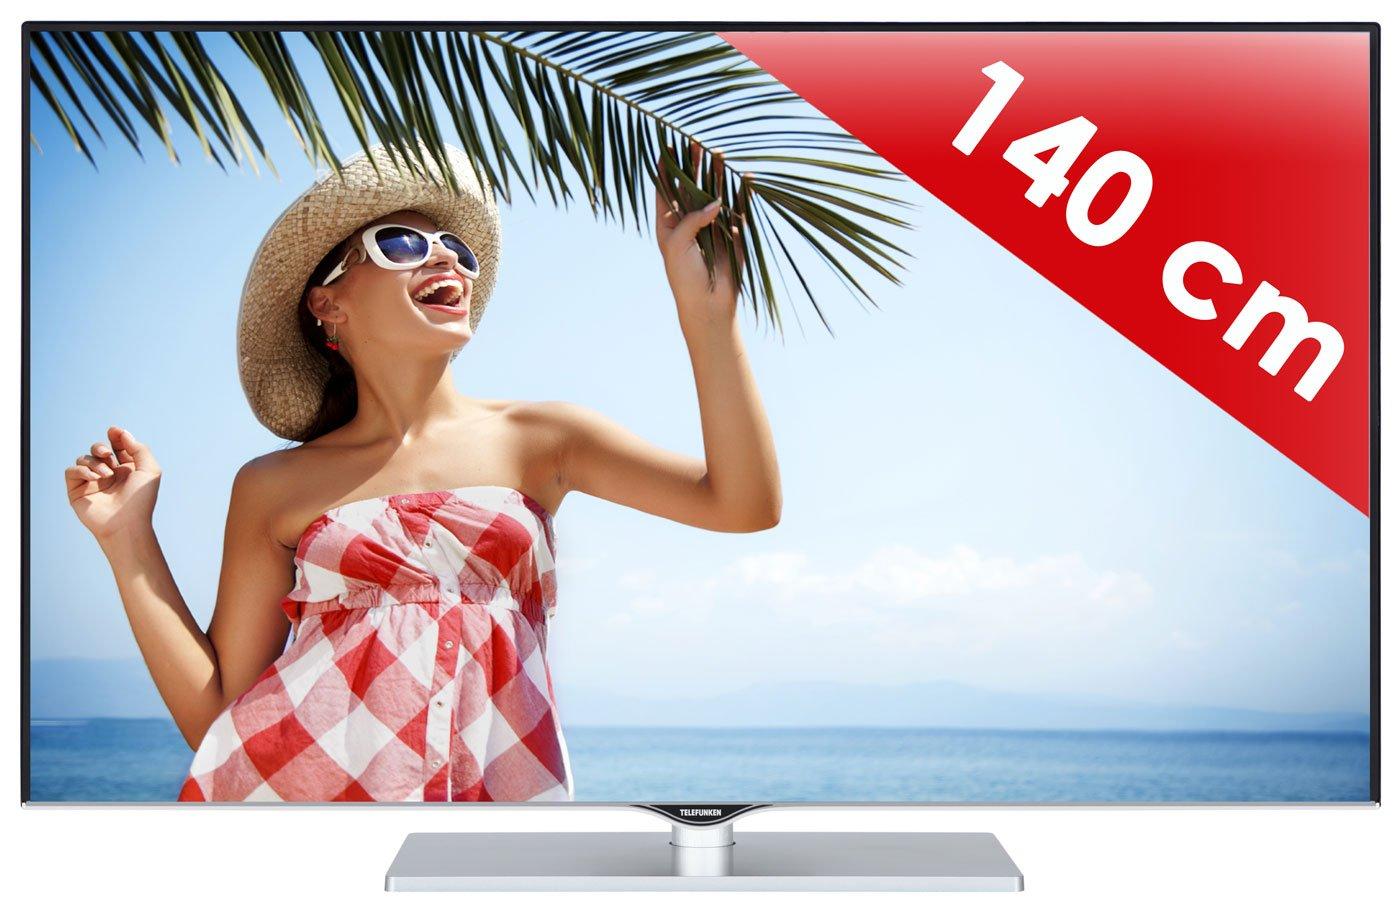 Telefunken – televiseurs LED de 55 Pulgadas TV VLT 55 N 03 CWB 6: Amazon.es: Electrónica